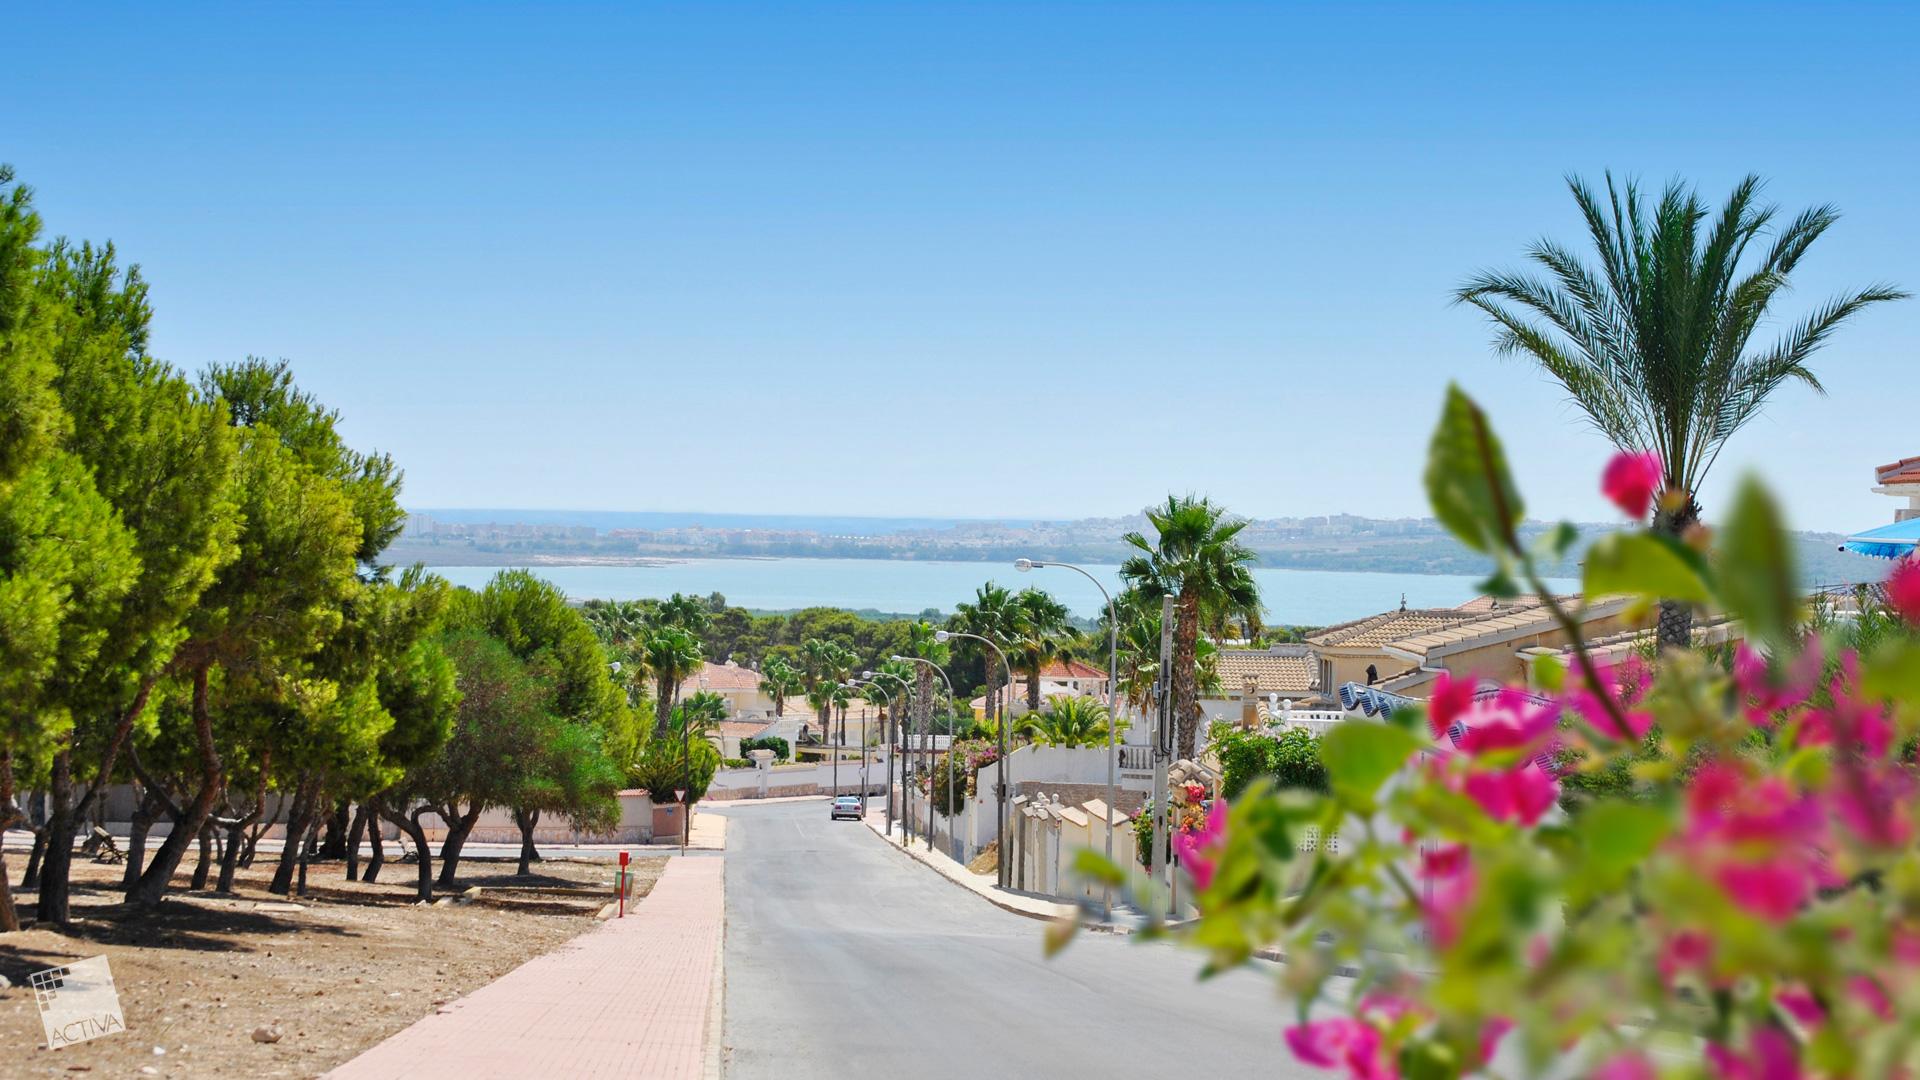 Image Sensational Design Villa in Quesada 10